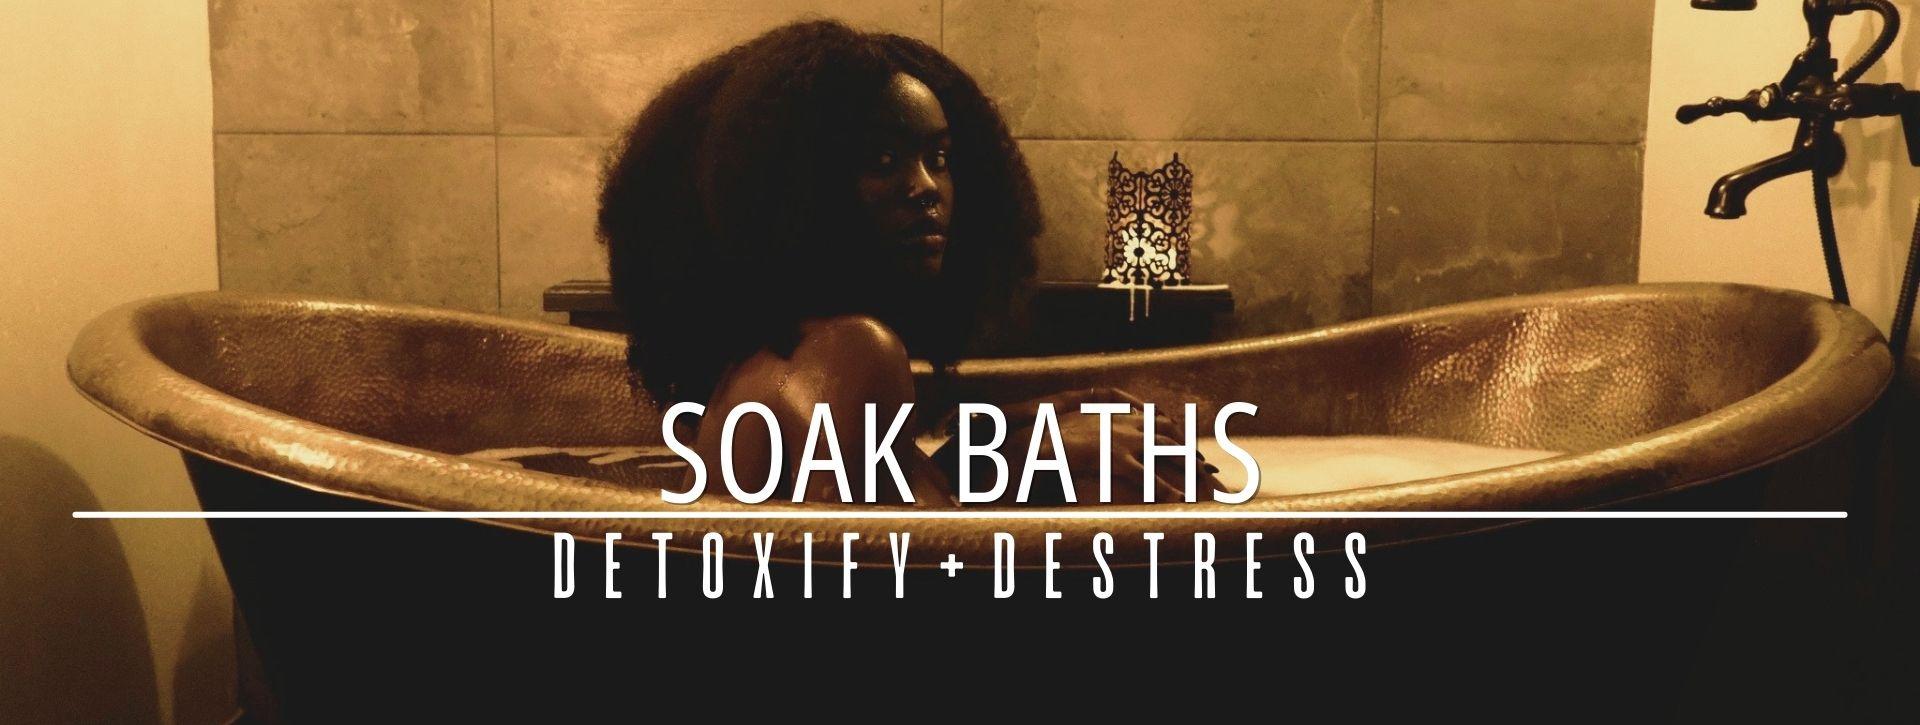 woman in a bathtub having soak baths promoting detoxify + destress